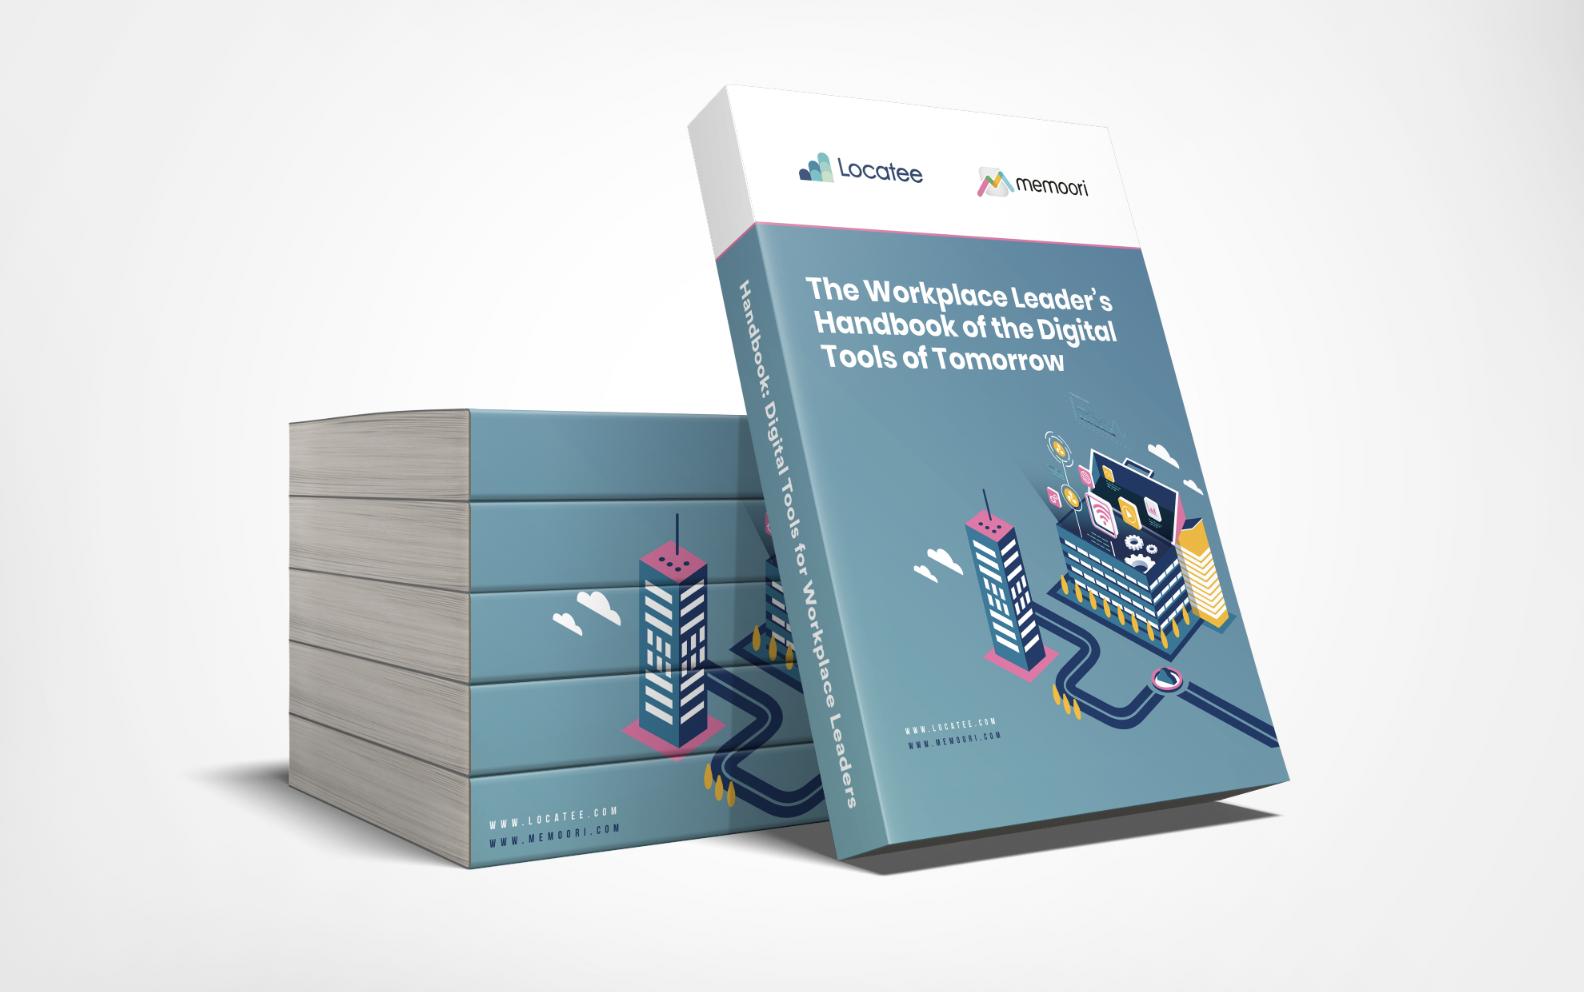 New Handbook: The Digital Tools of Tomorrow